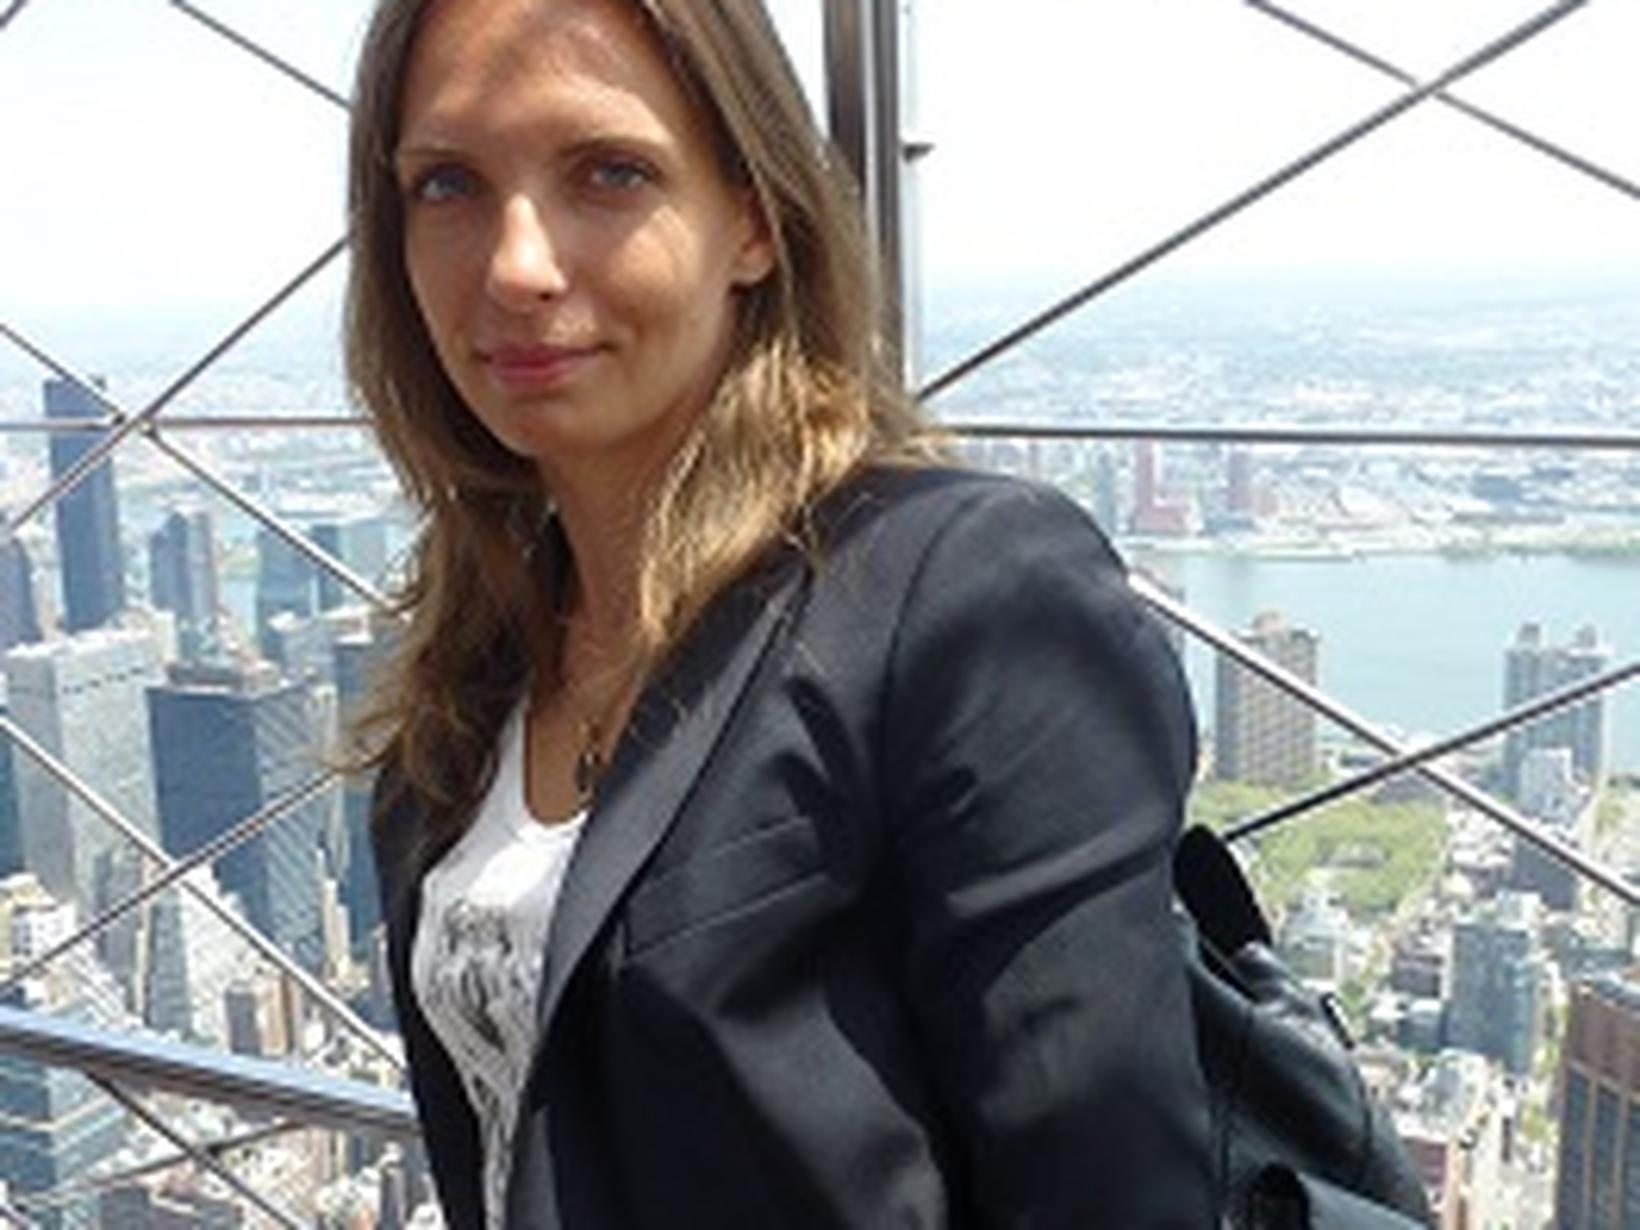 Olga from London, United Kingdom